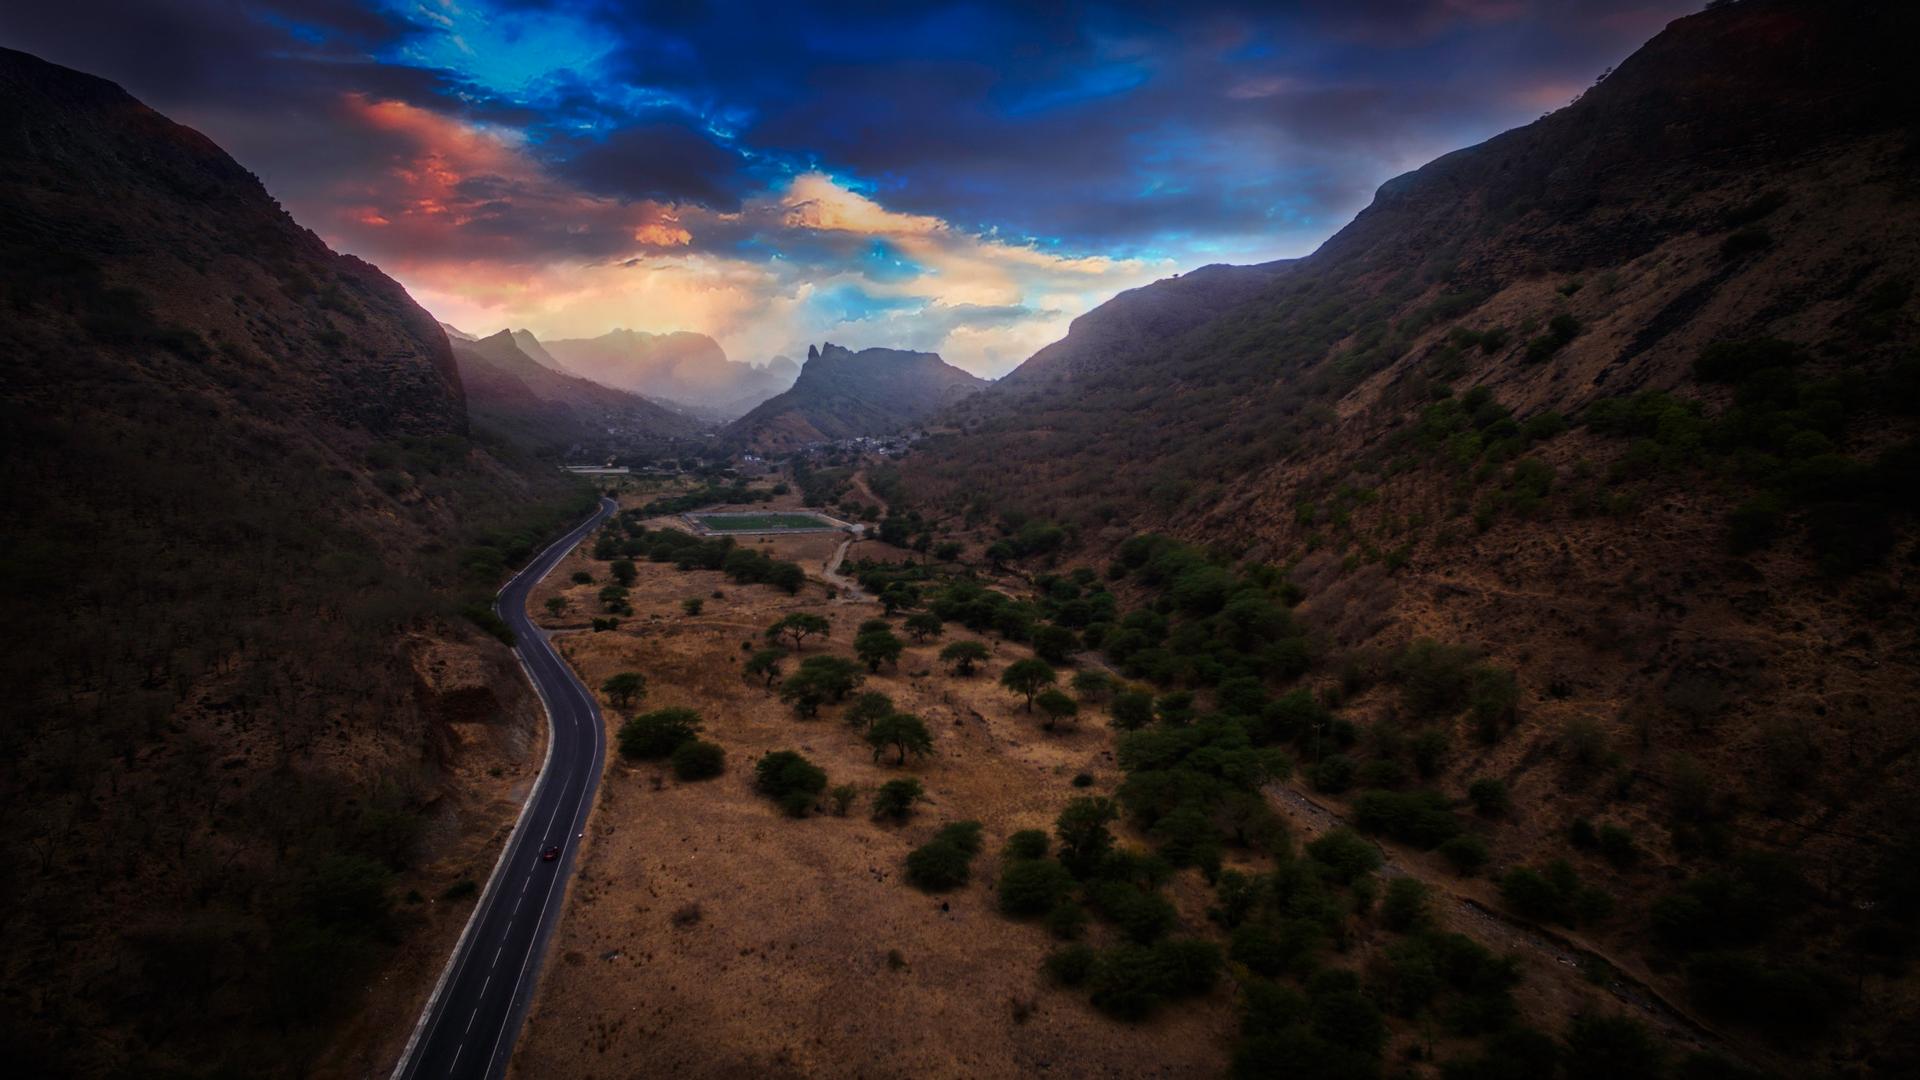 A view in Cape Verde